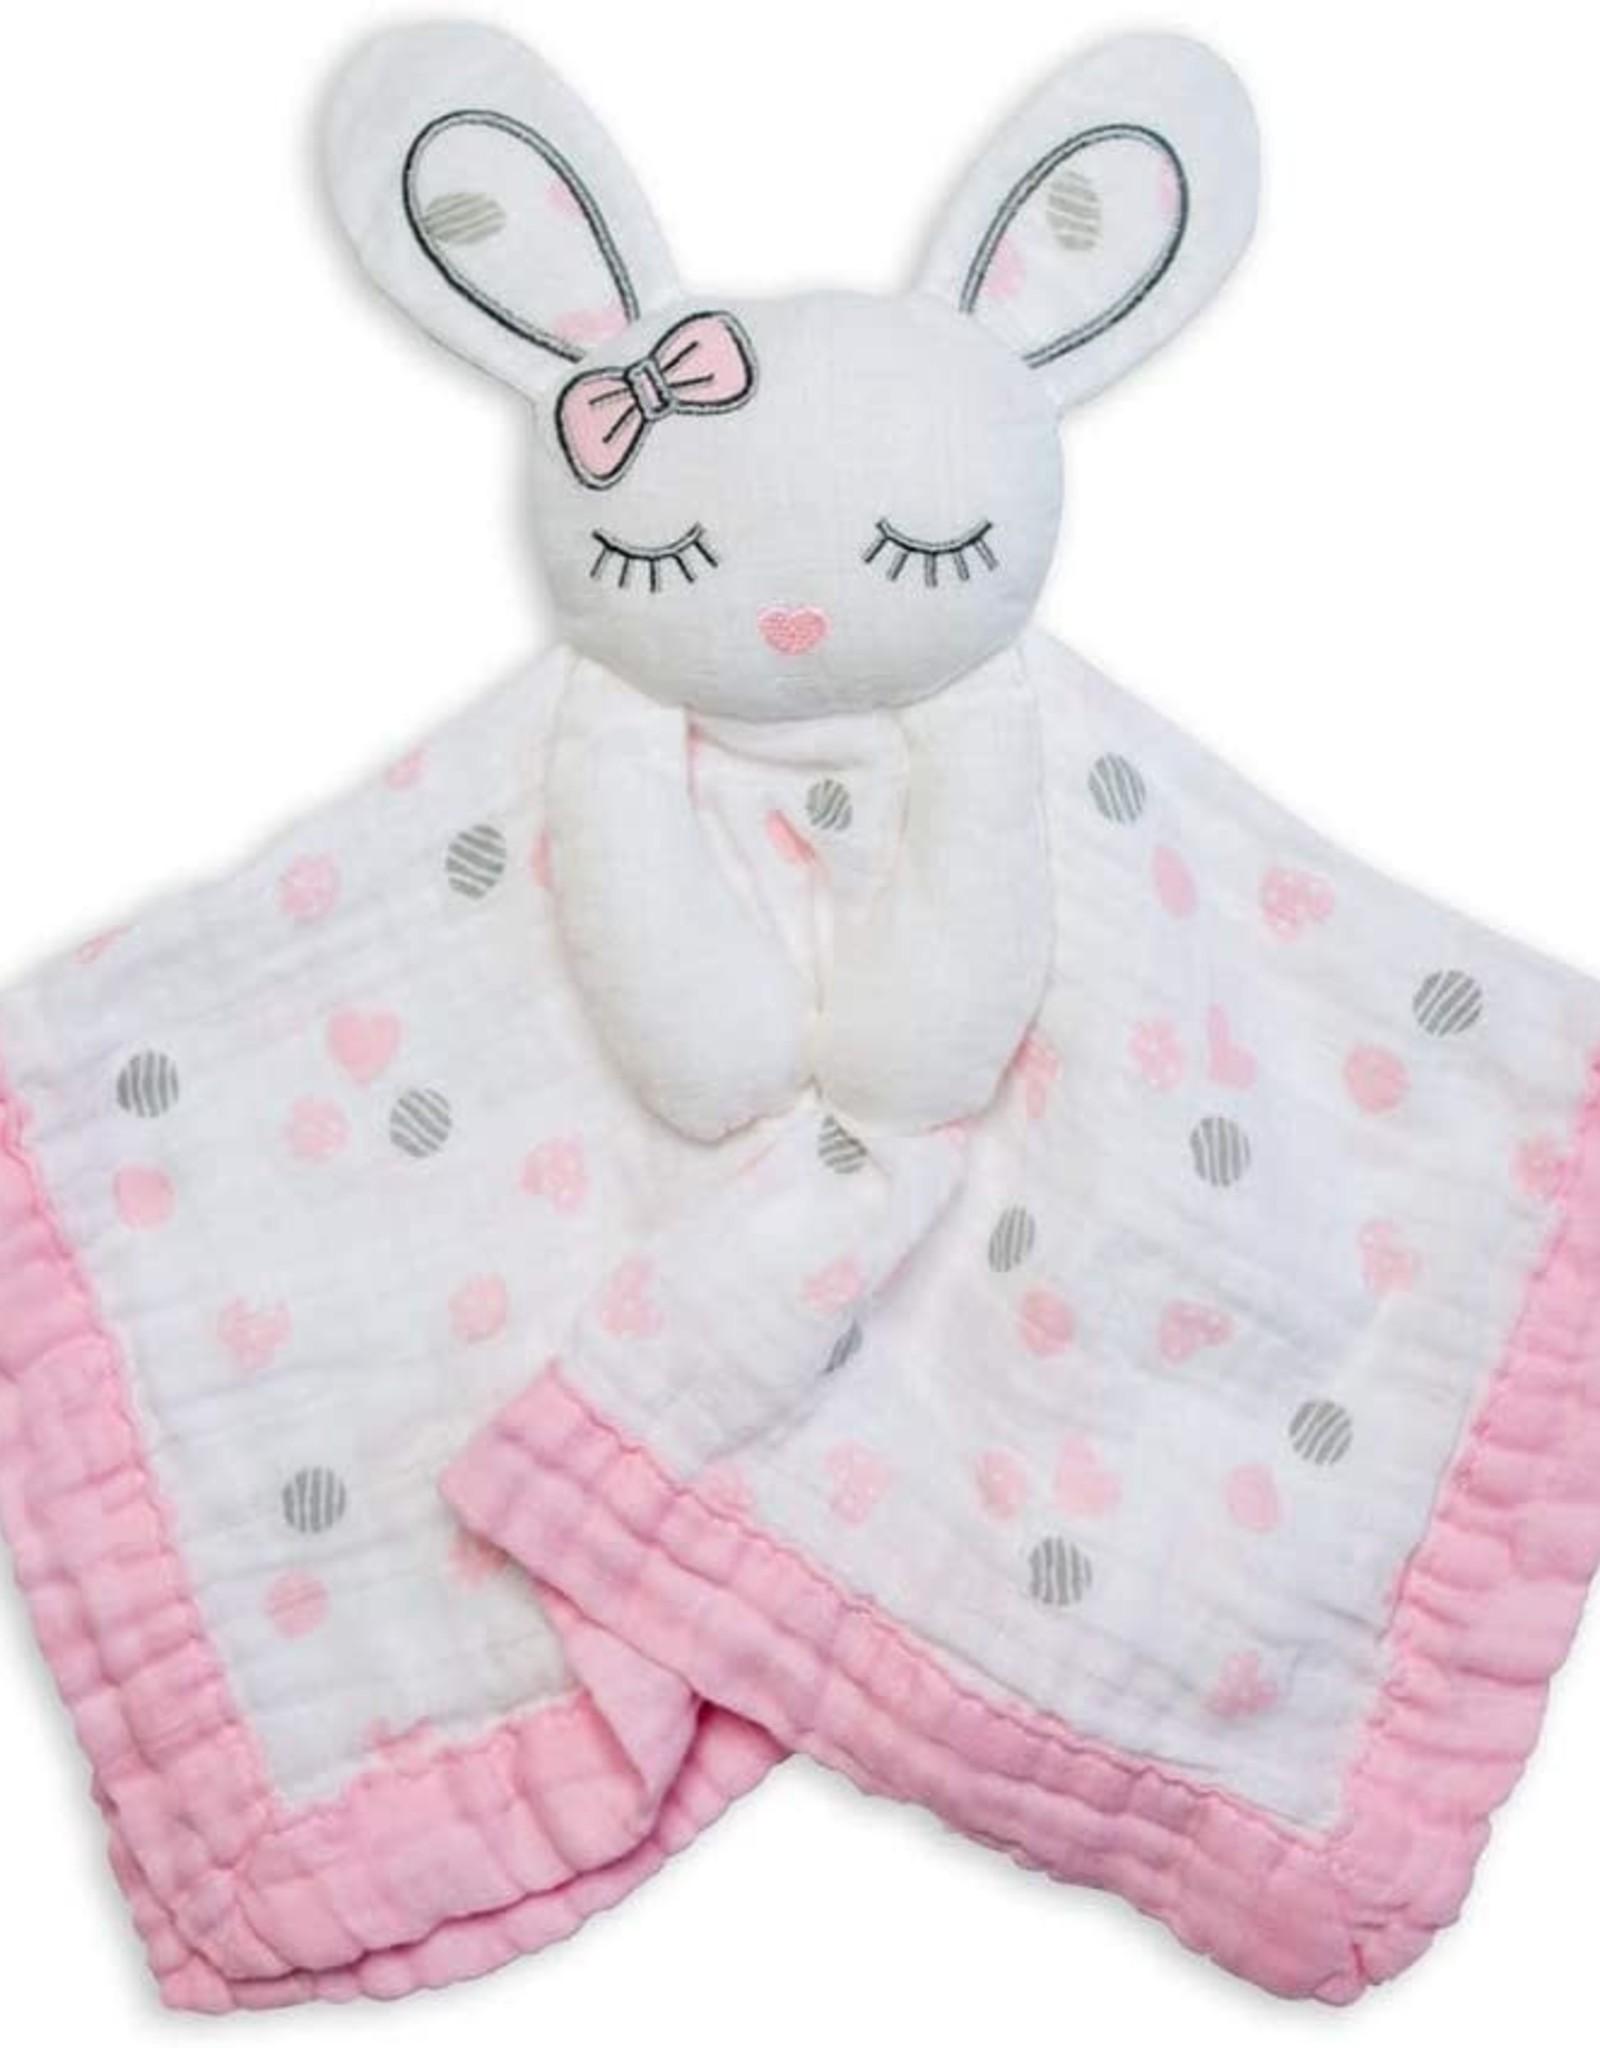 Lulujo Lulujo Muslin Cotton Lovie - Bunny